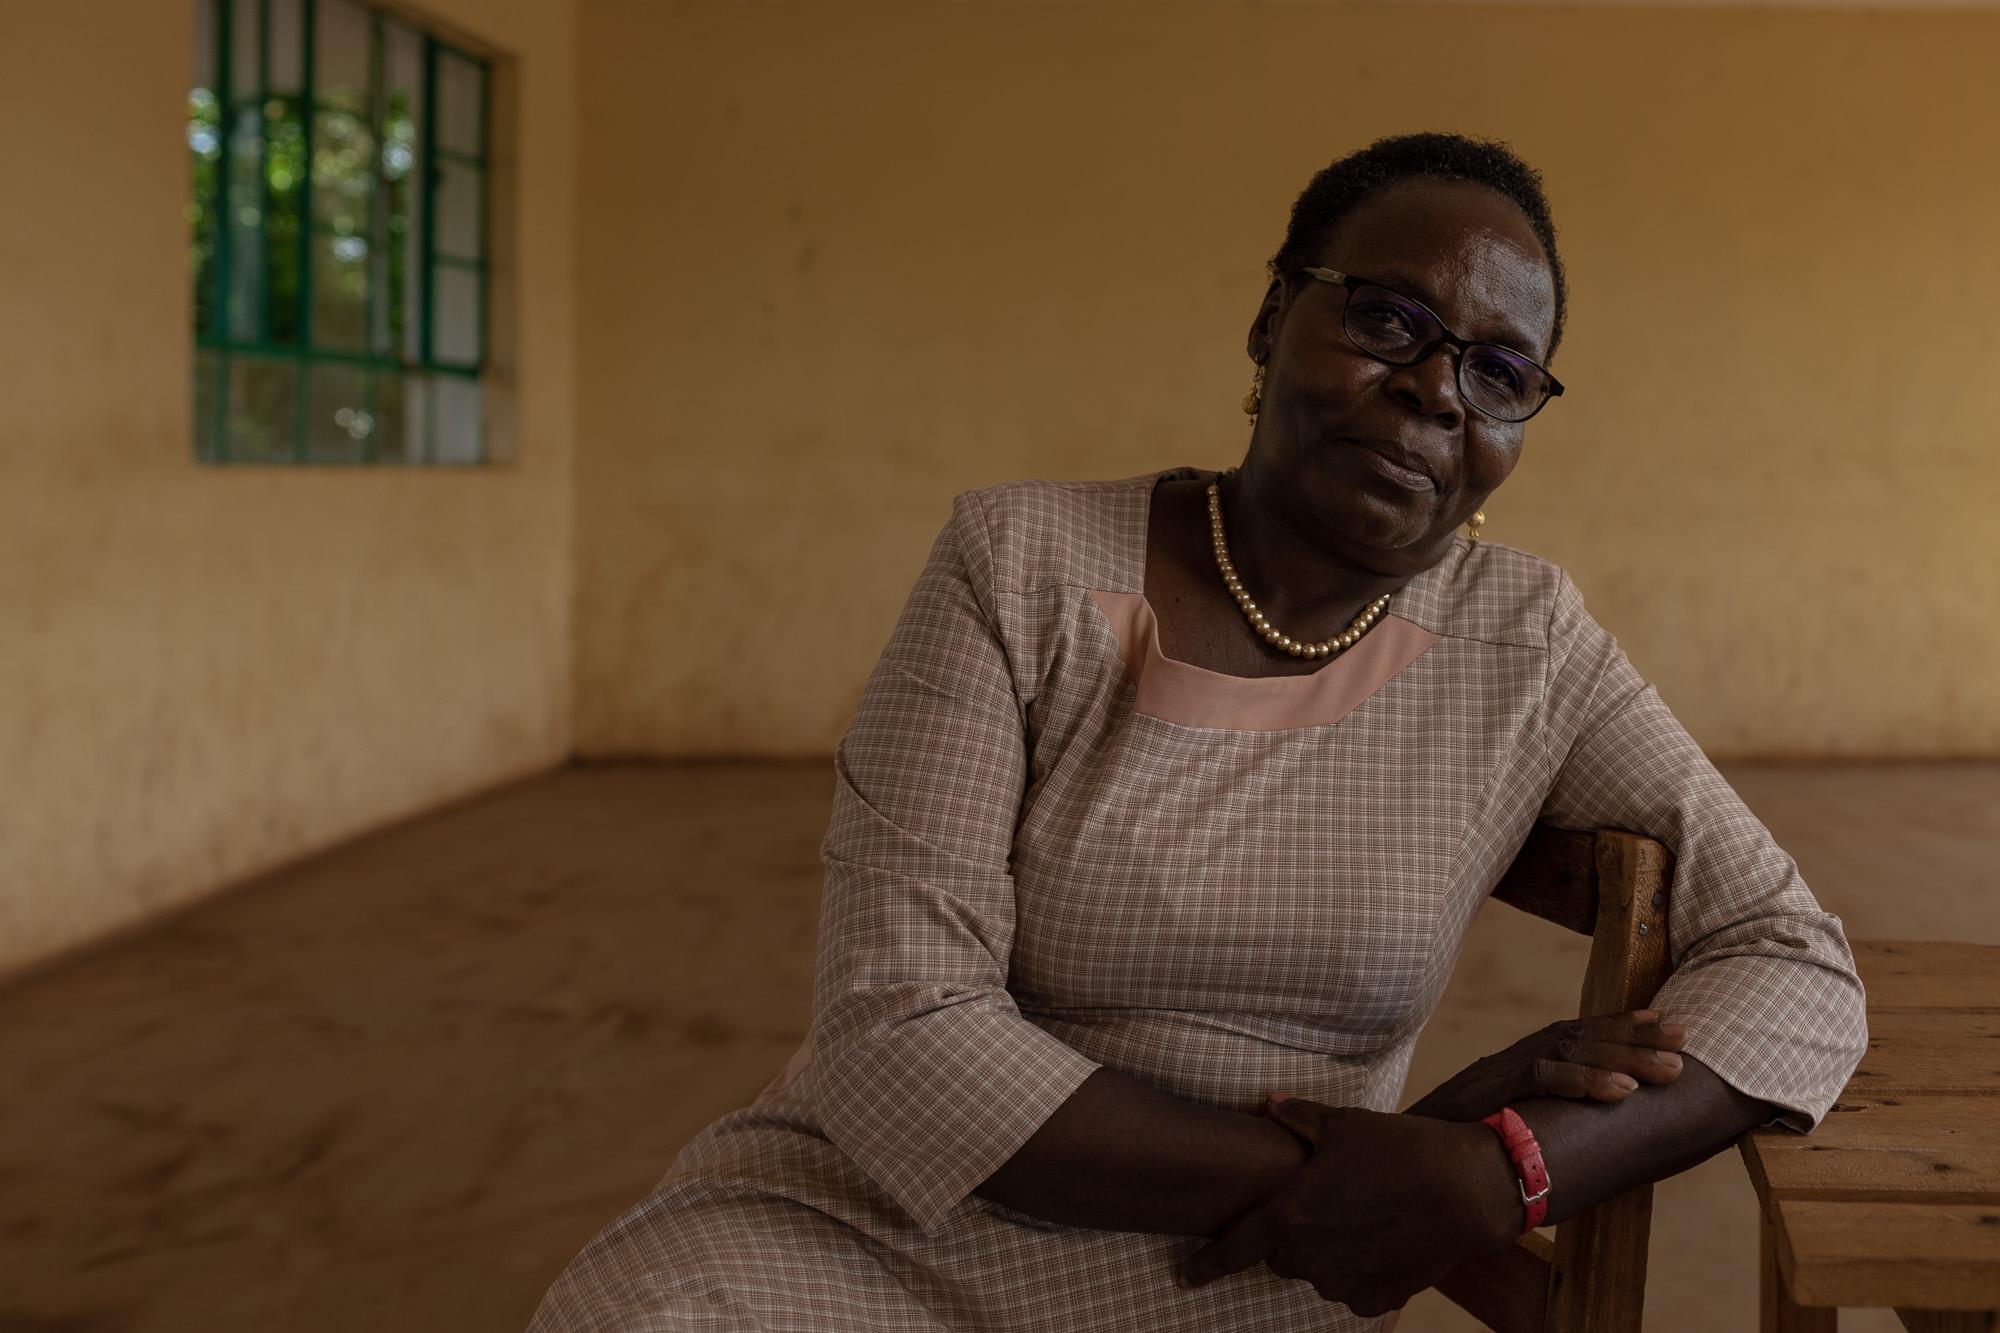 Aniceta Kiriga, 60, started the Alternative Rite of Passage Cere